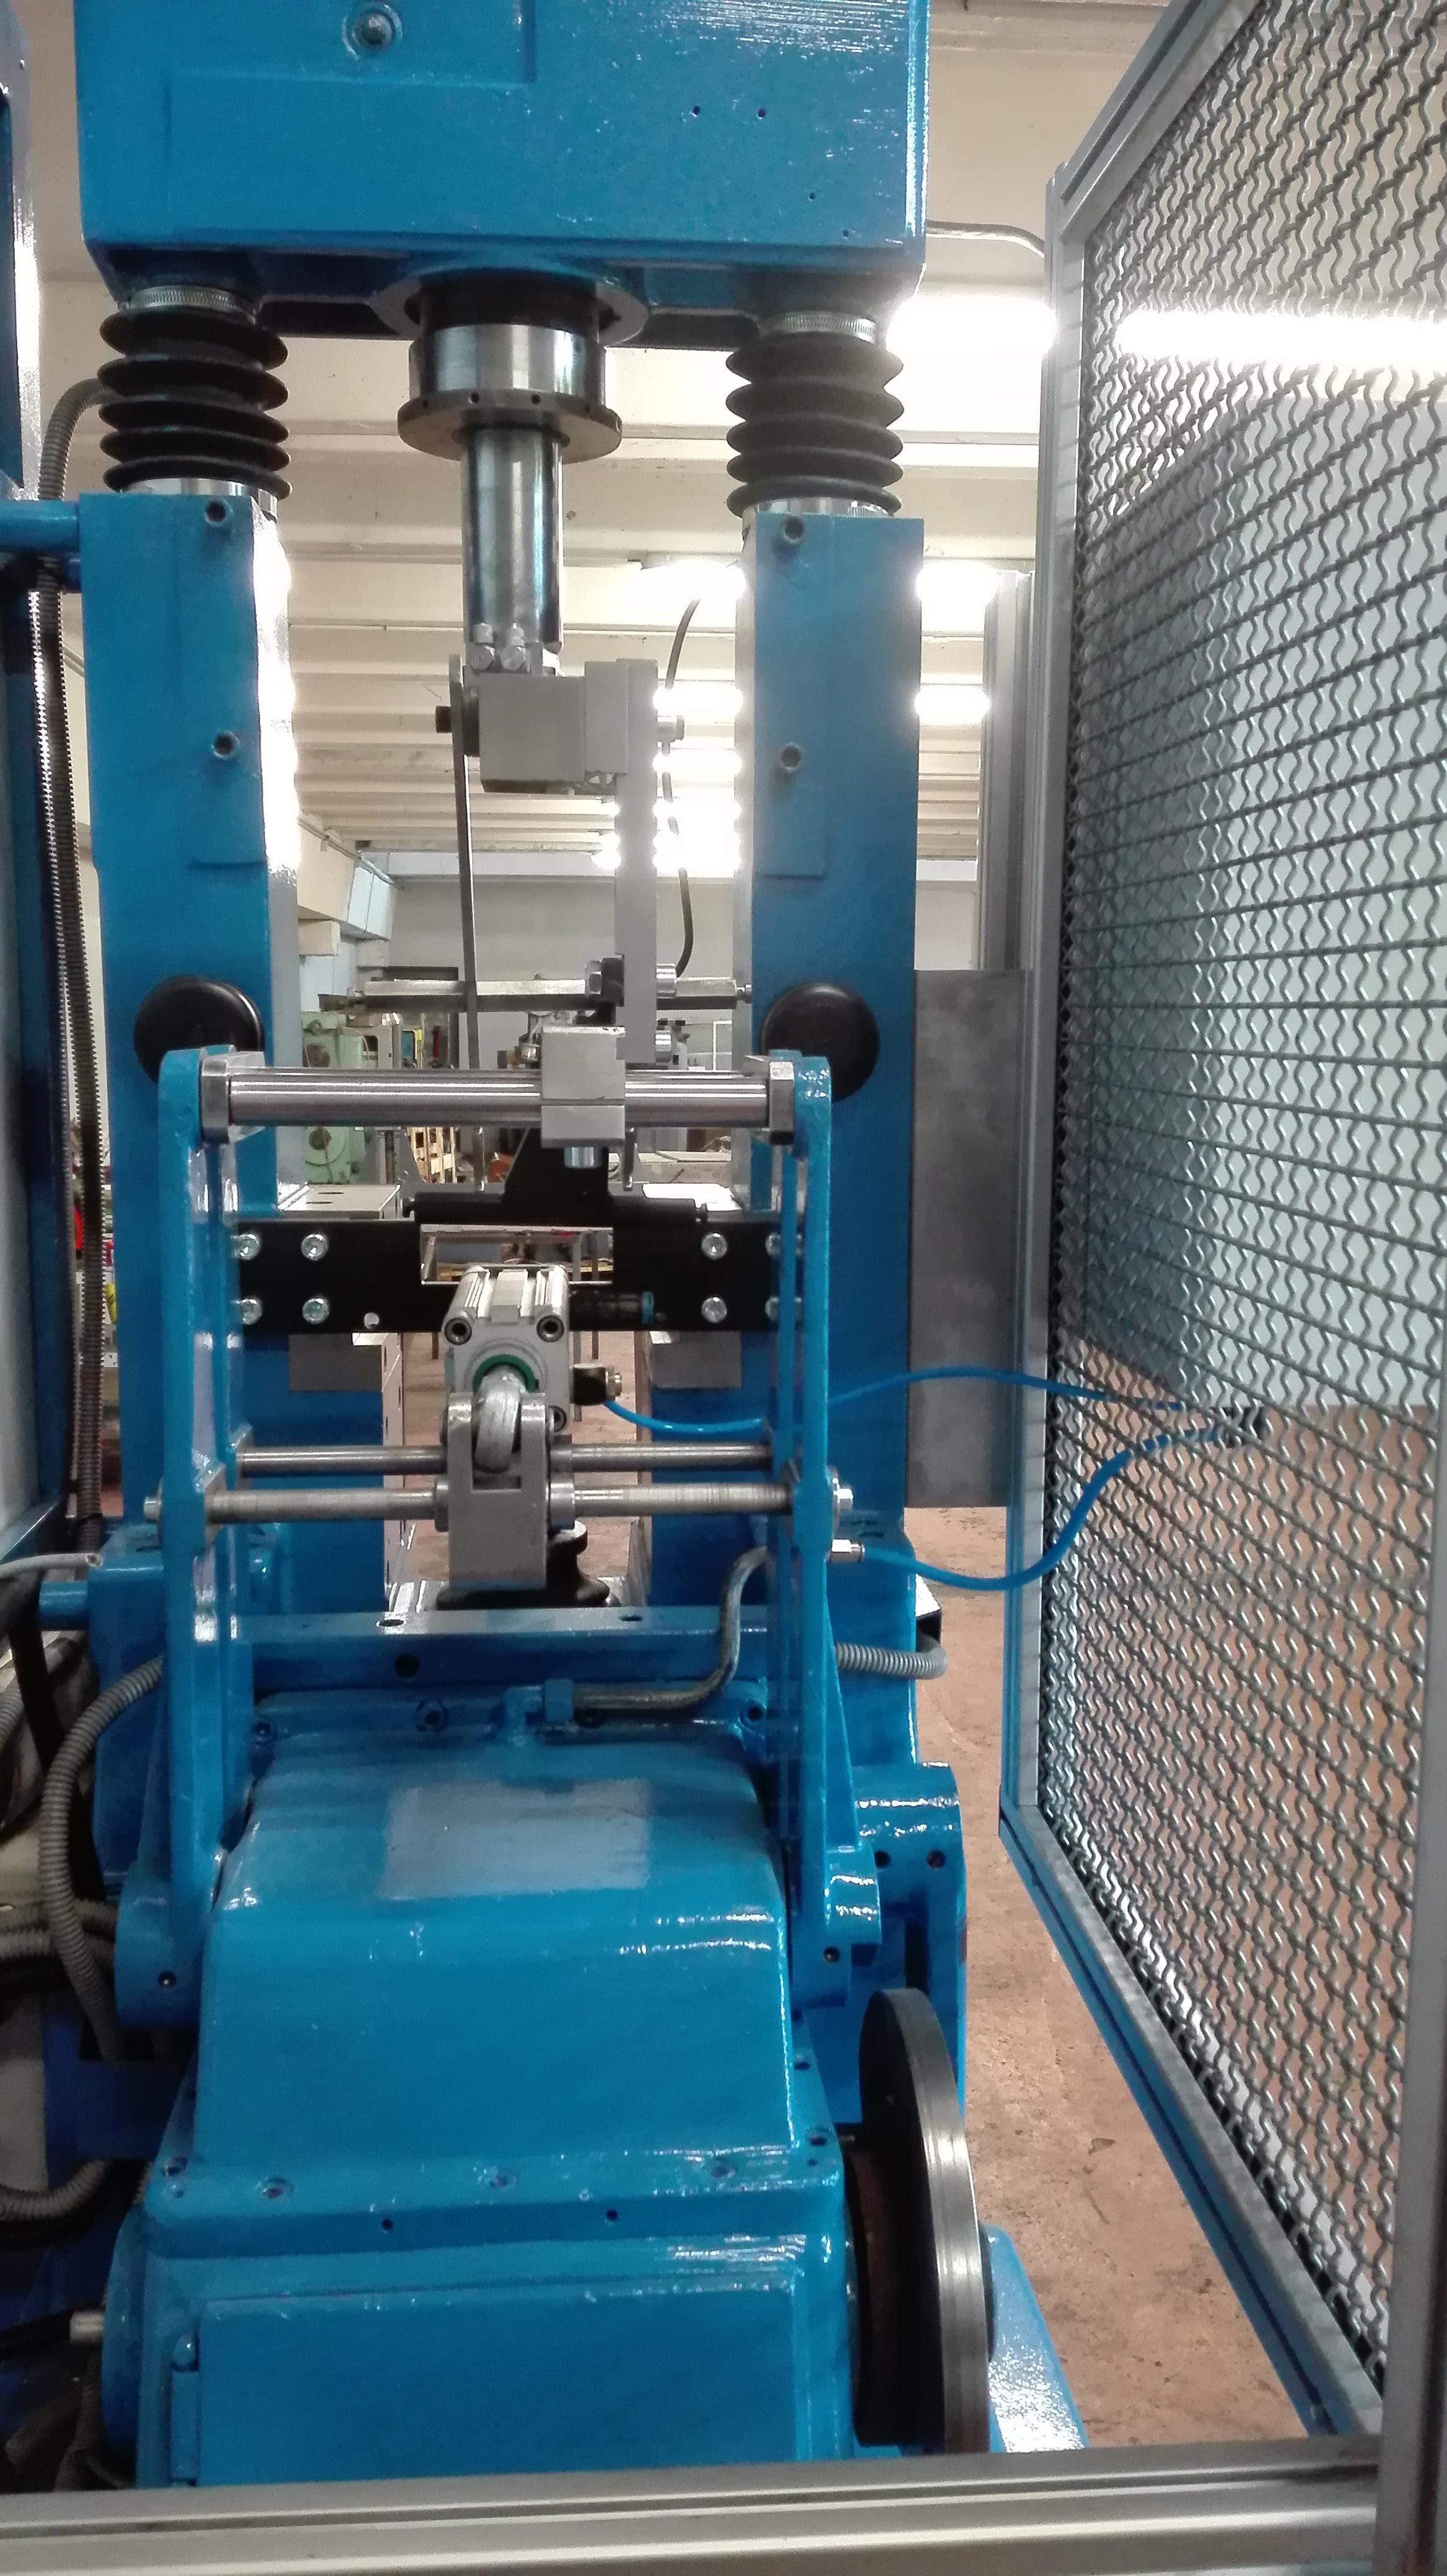 Dorst TPA 15 metal press - Exapro